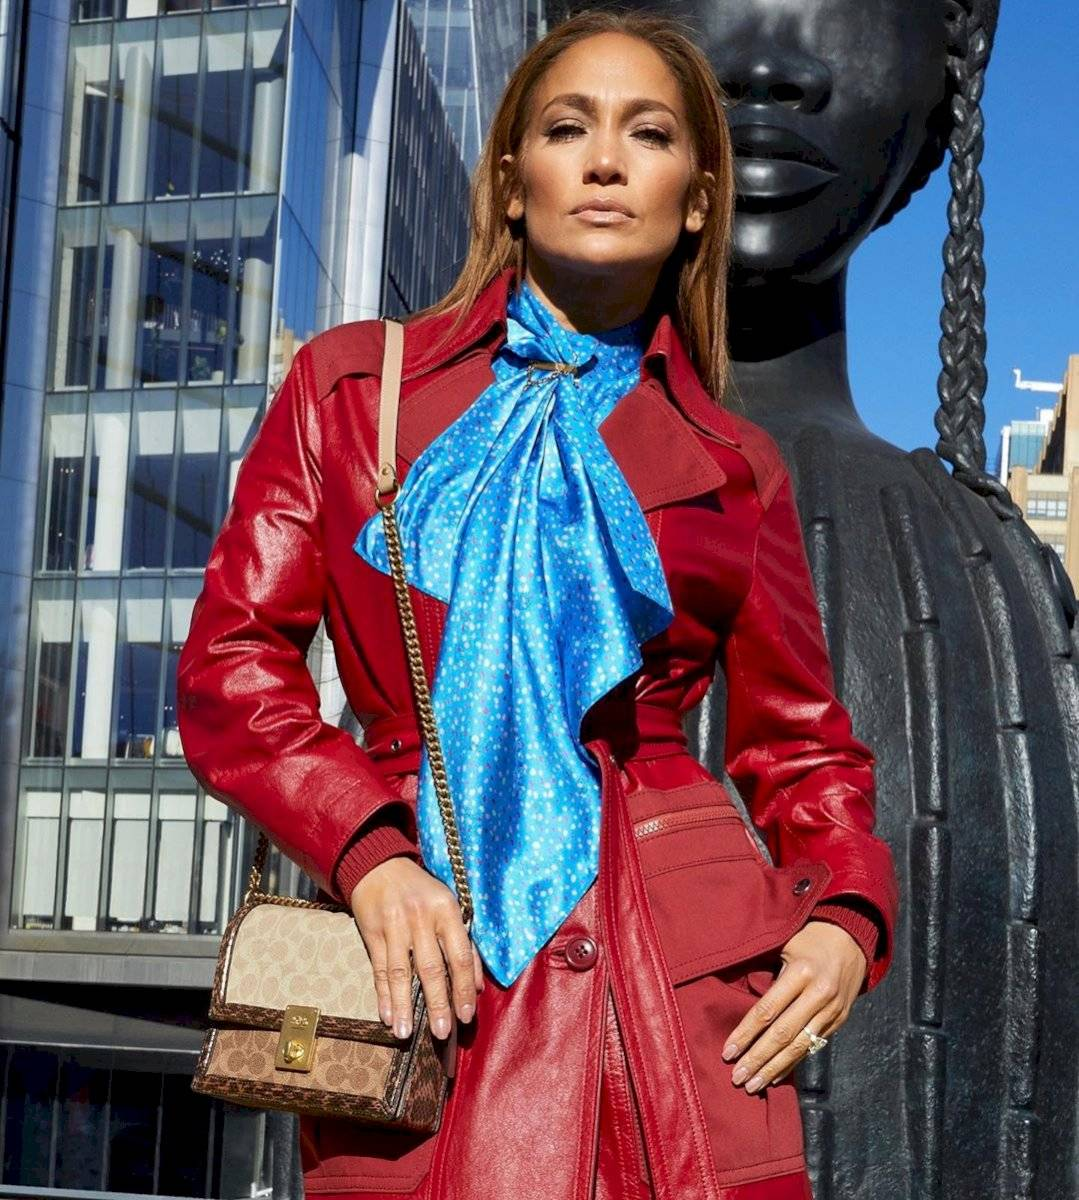 Jennifer Lopez impacta en New York con unos outfits de lujo